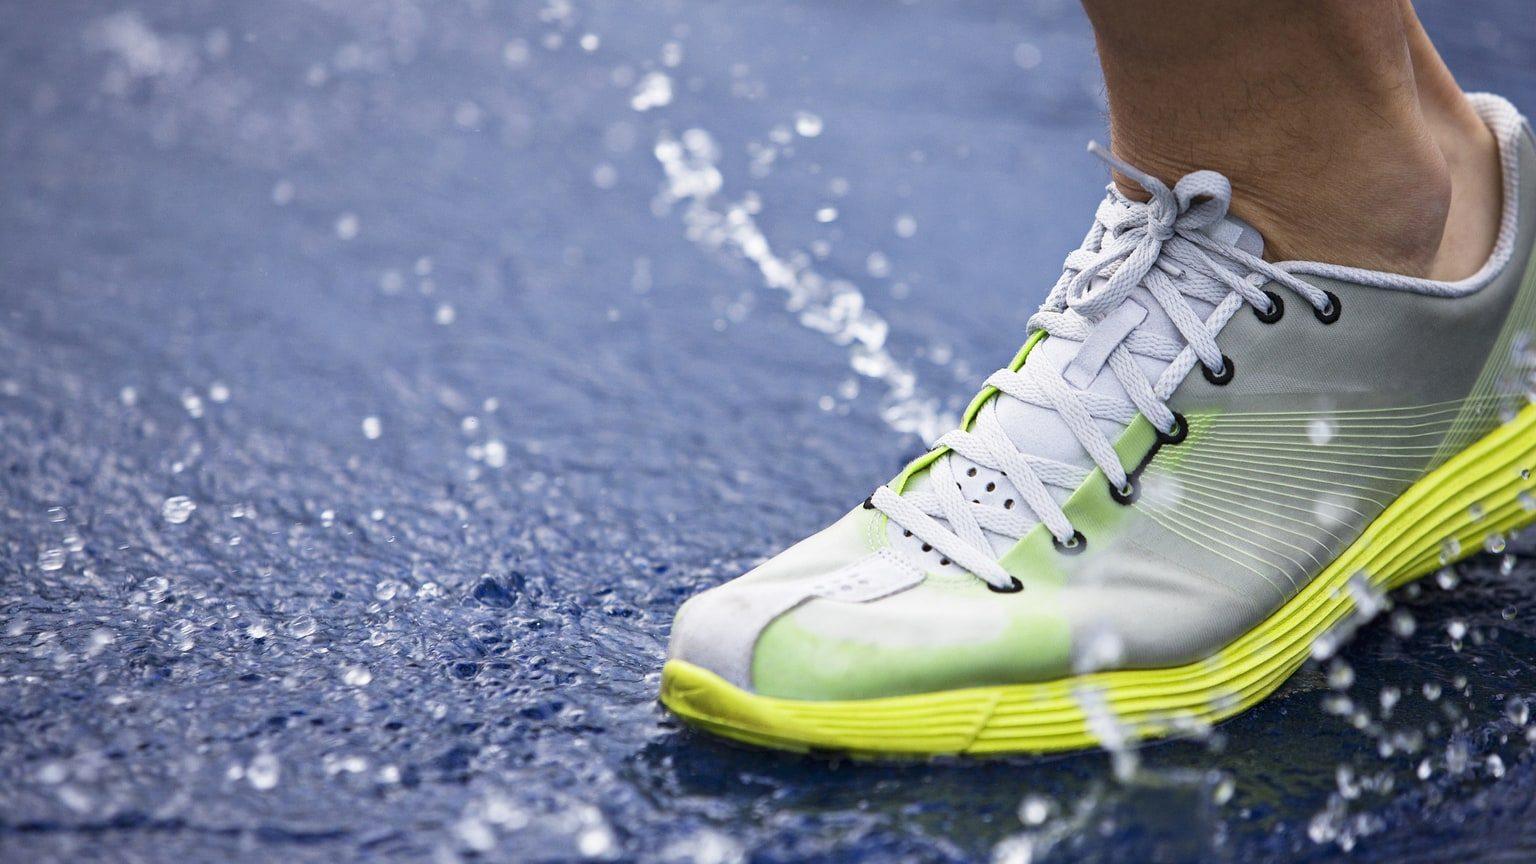 Closeup of grey running shoe on wet pavement